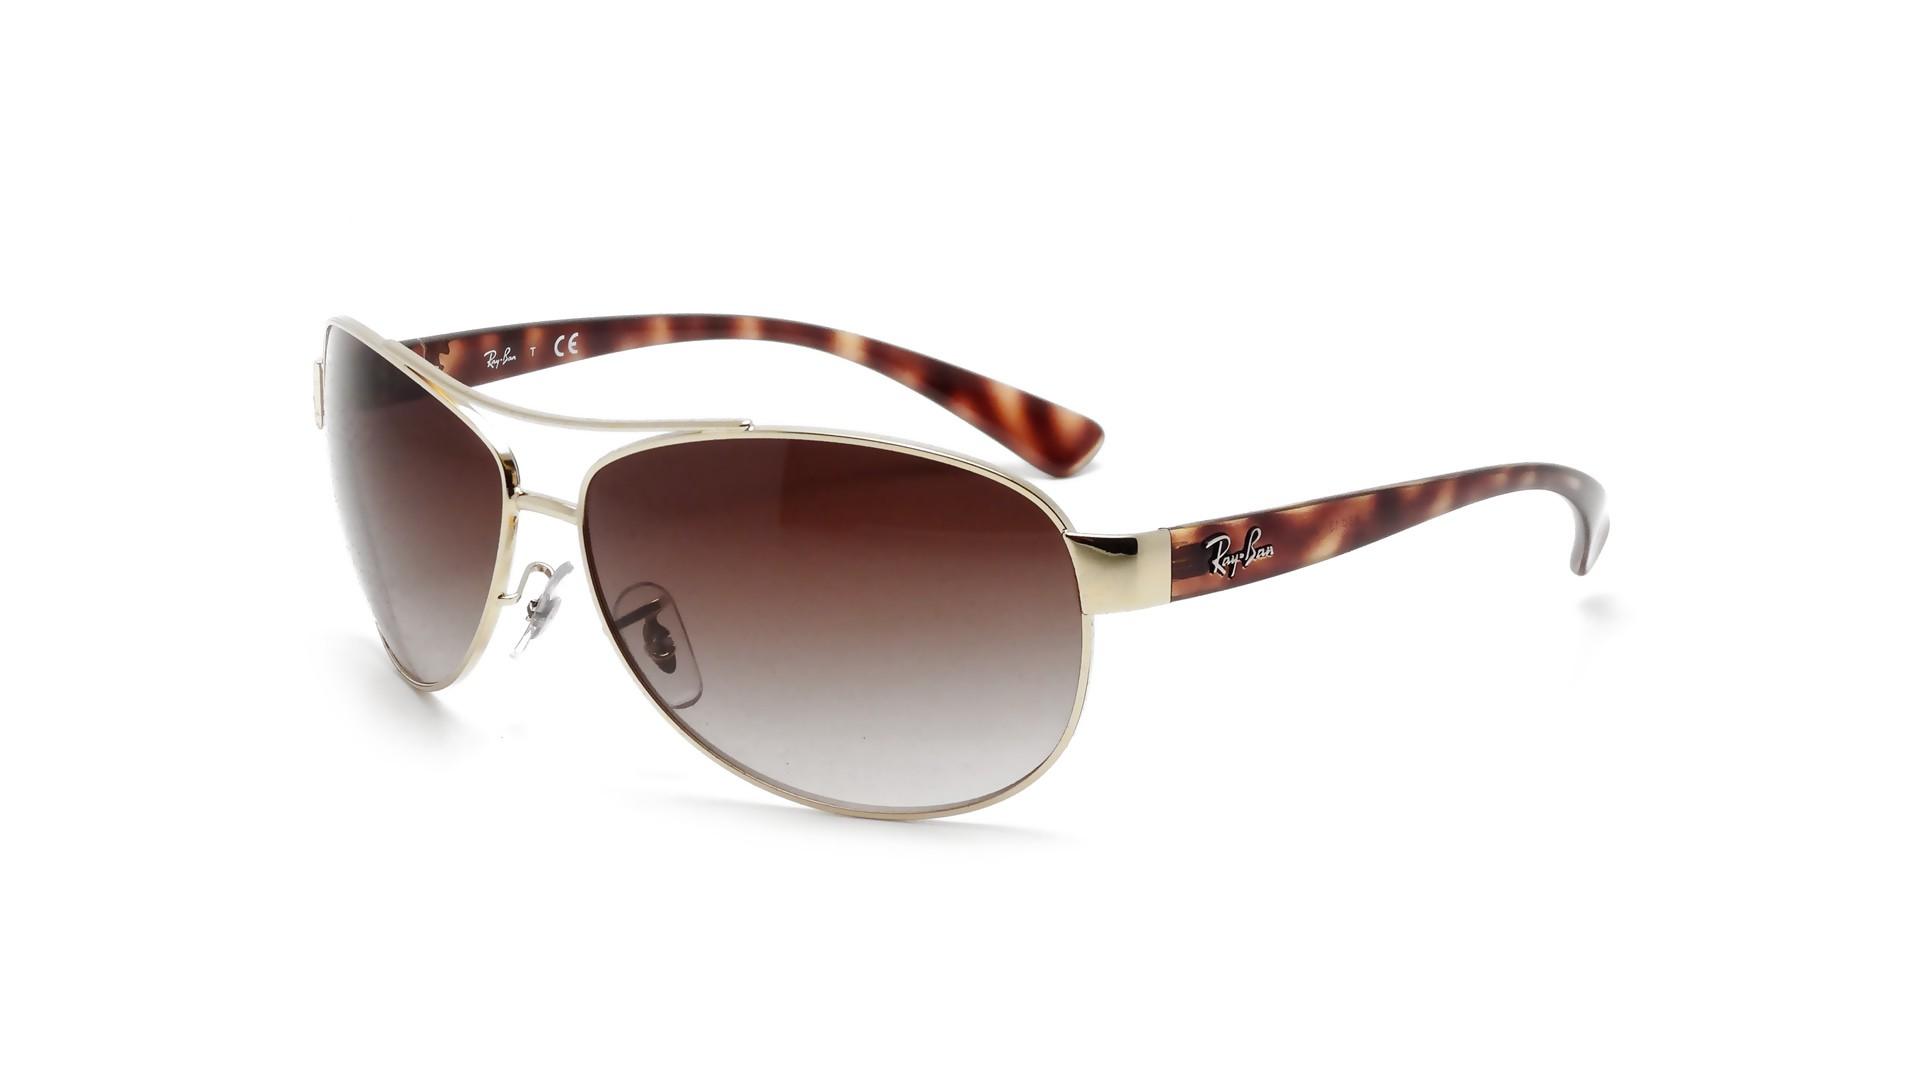 4e112454225 Sunglasses Ray-Ban RB3386 001 13 63-13 Gold Medium Gradient